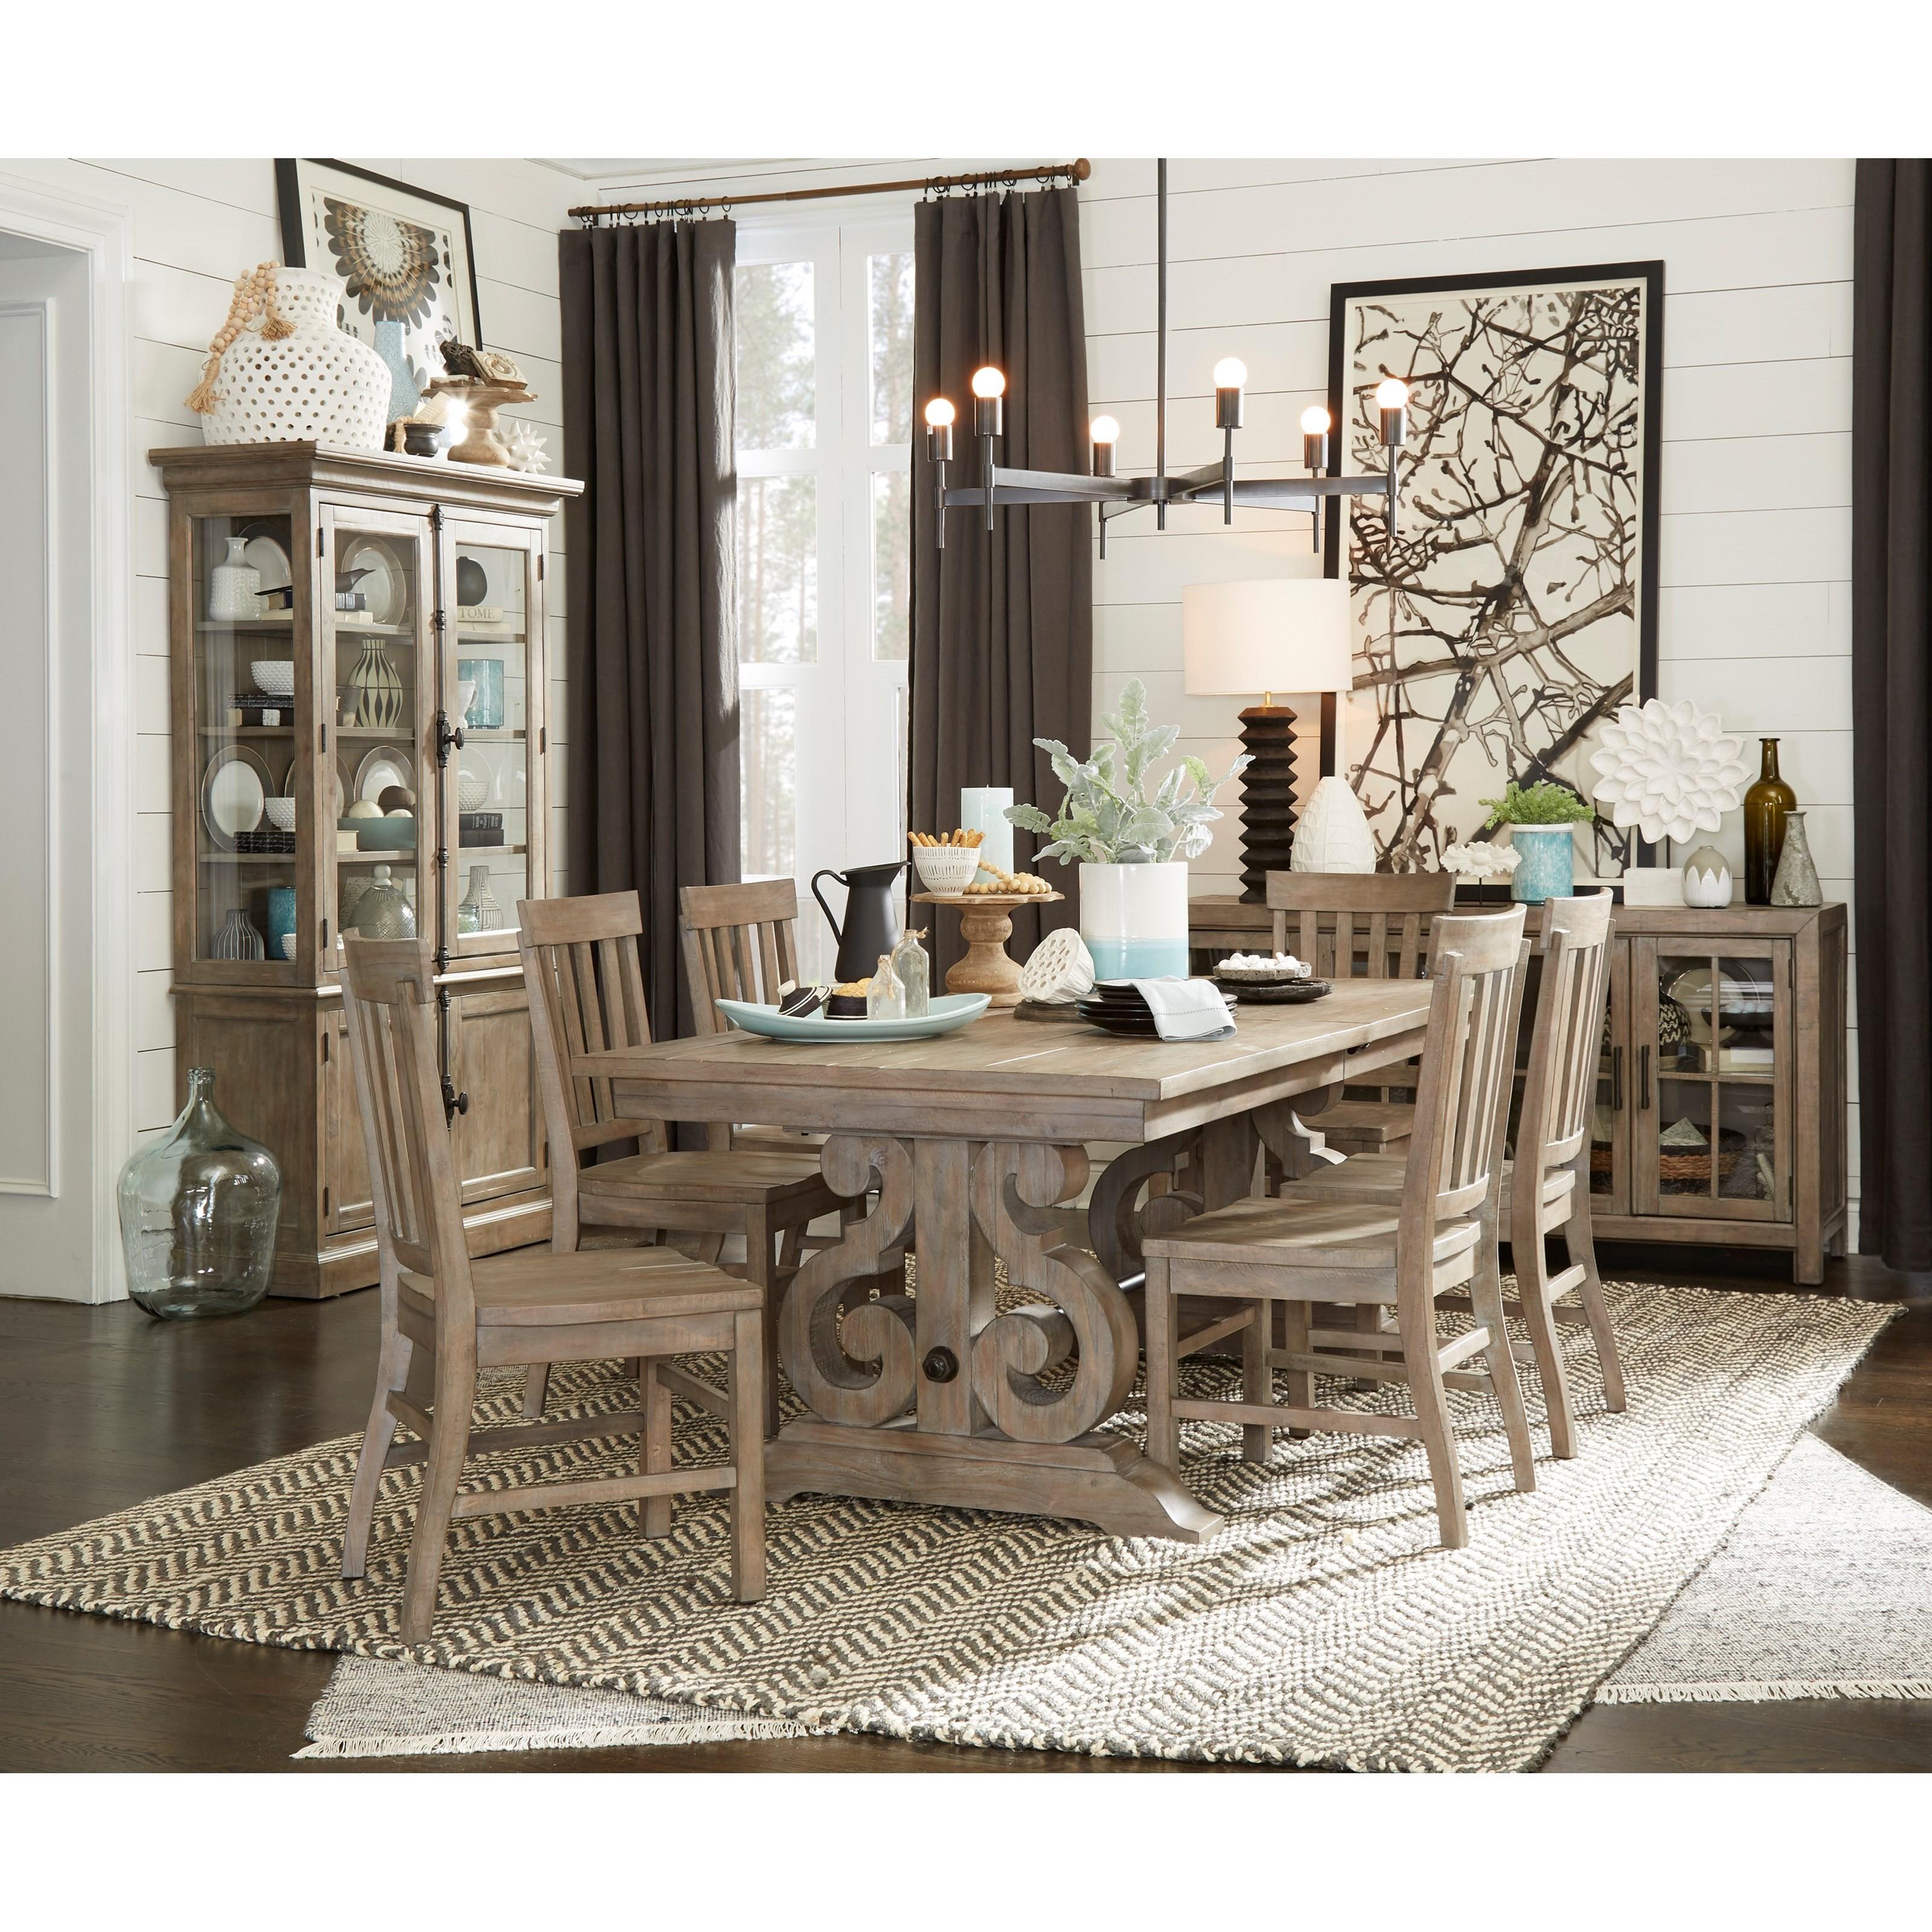 Tinley Park Formal Dining Room Group by Magnussen Home at Baer's Furniture